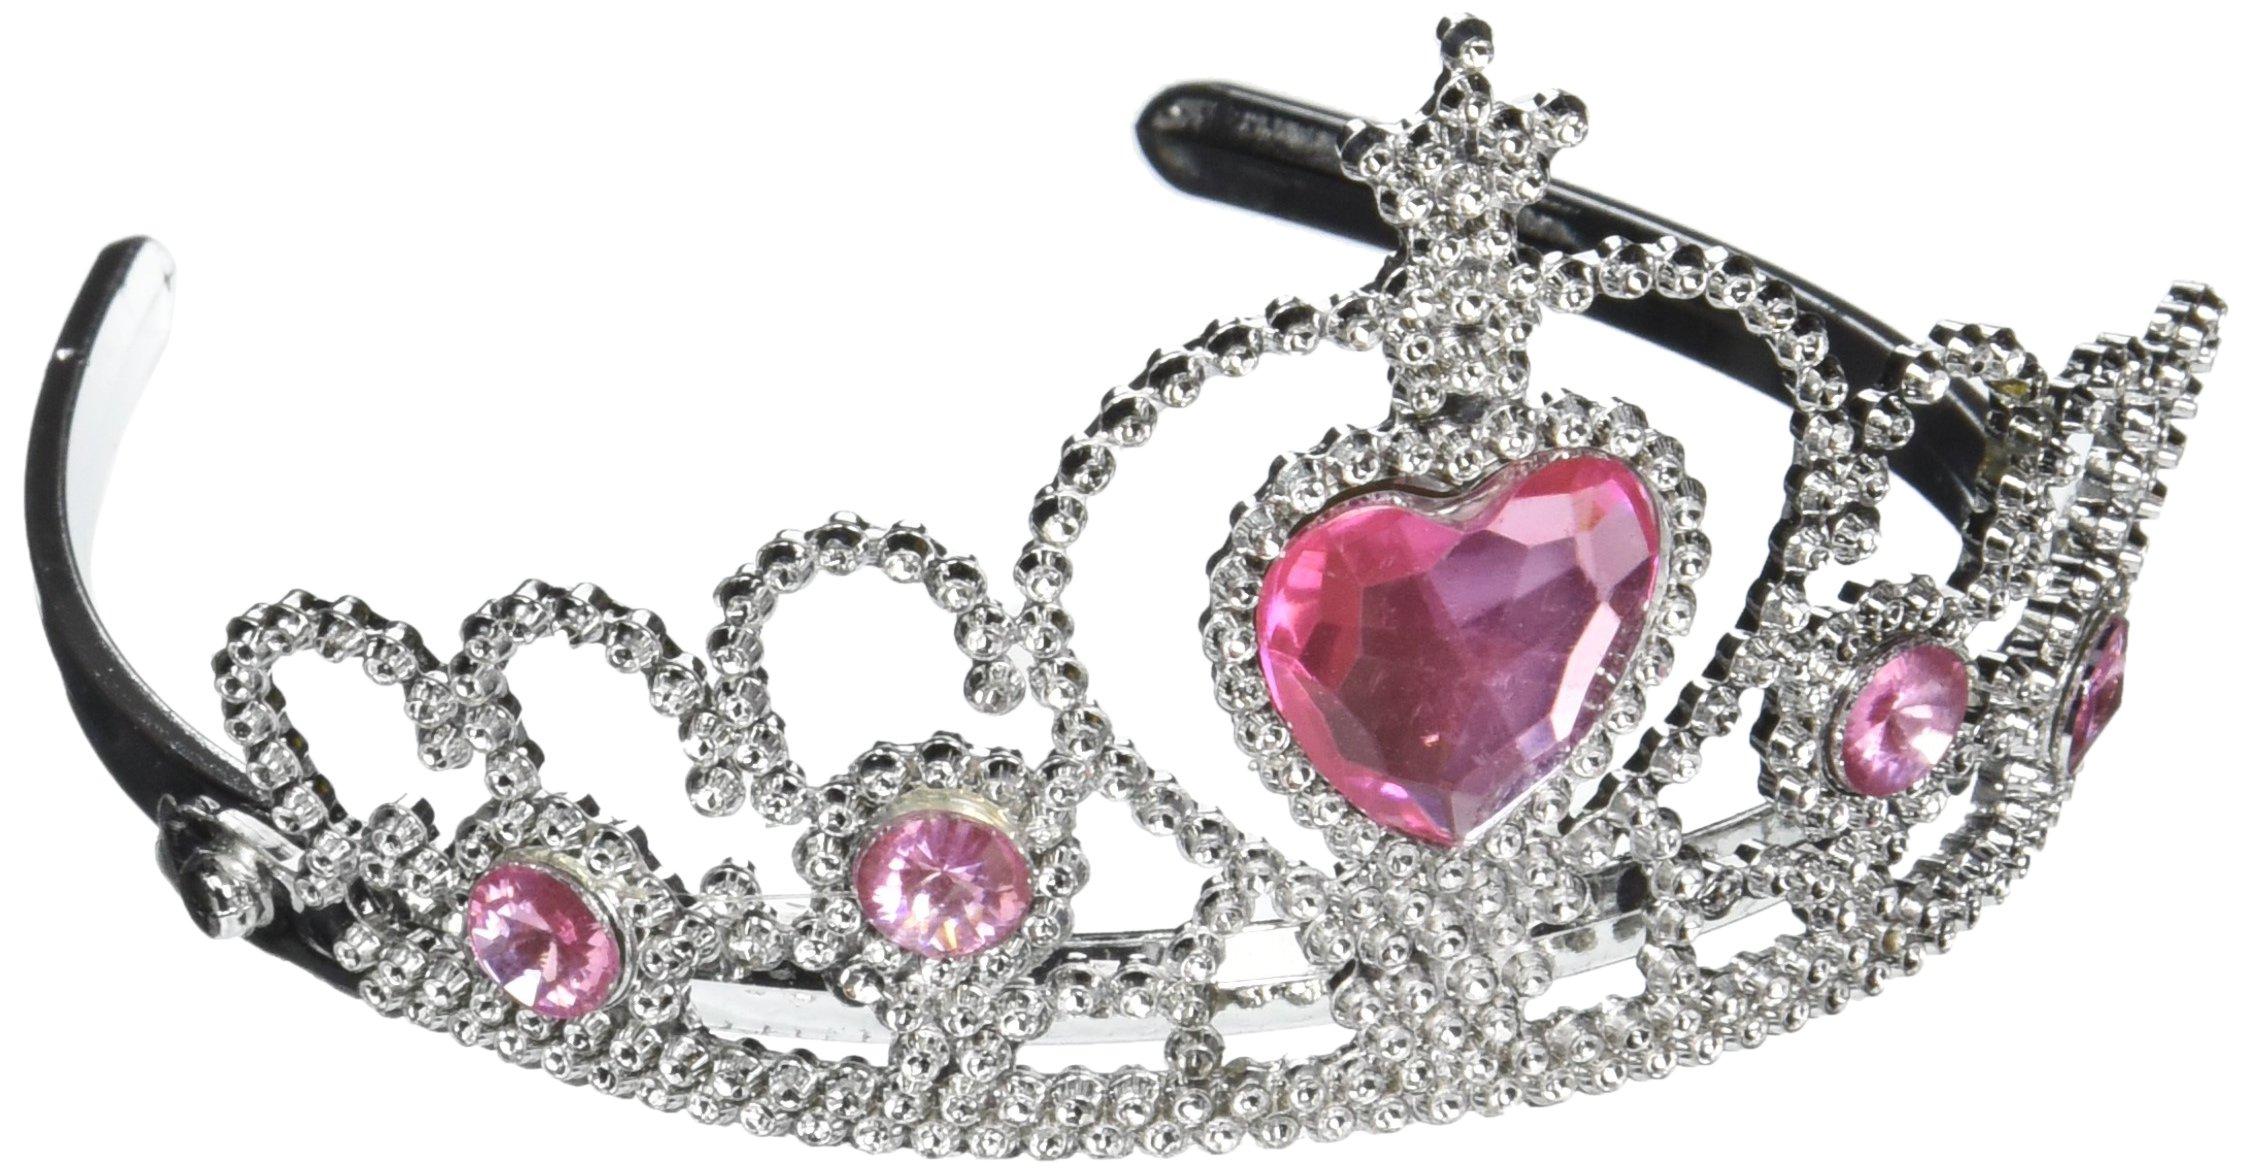 Rhode Island Novelty Tiara with Pink Heart Jewel